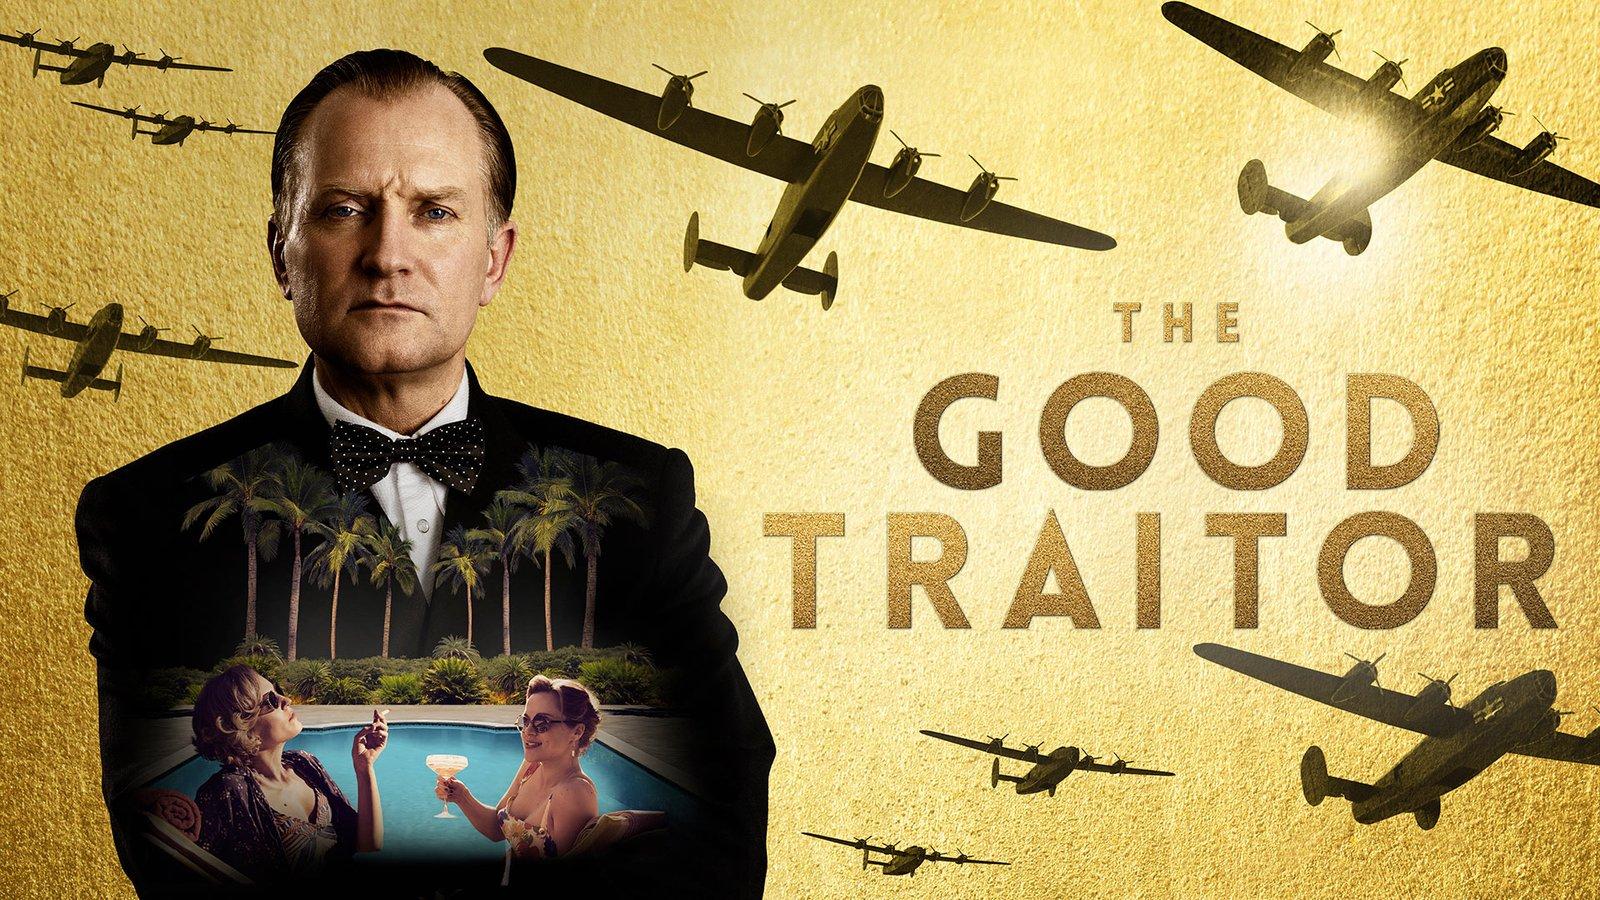 The Good Traitor - Vores mand i Amerika